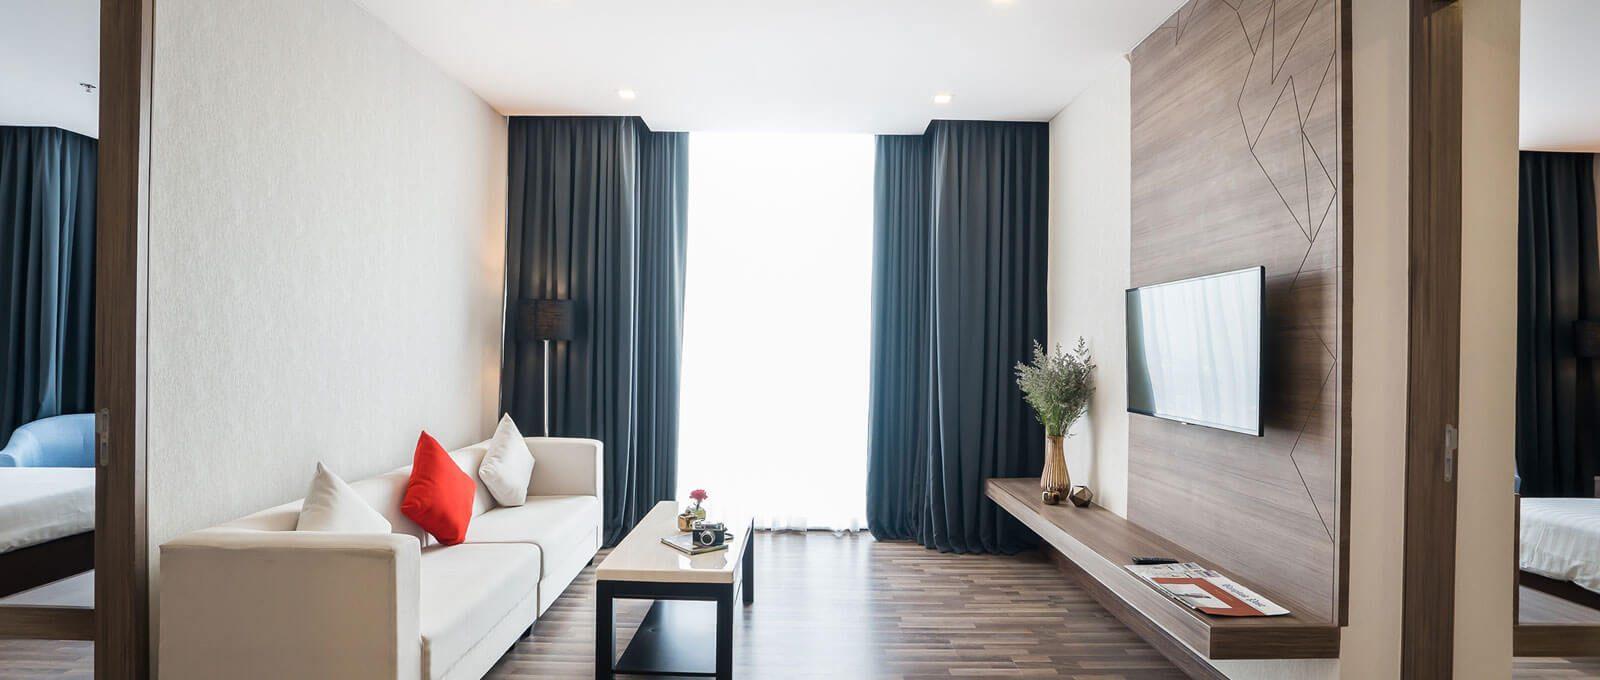 Family Hotel Bangkok | Two Bedroom Suite | BEST WESTERN PLUS Wanda Grand